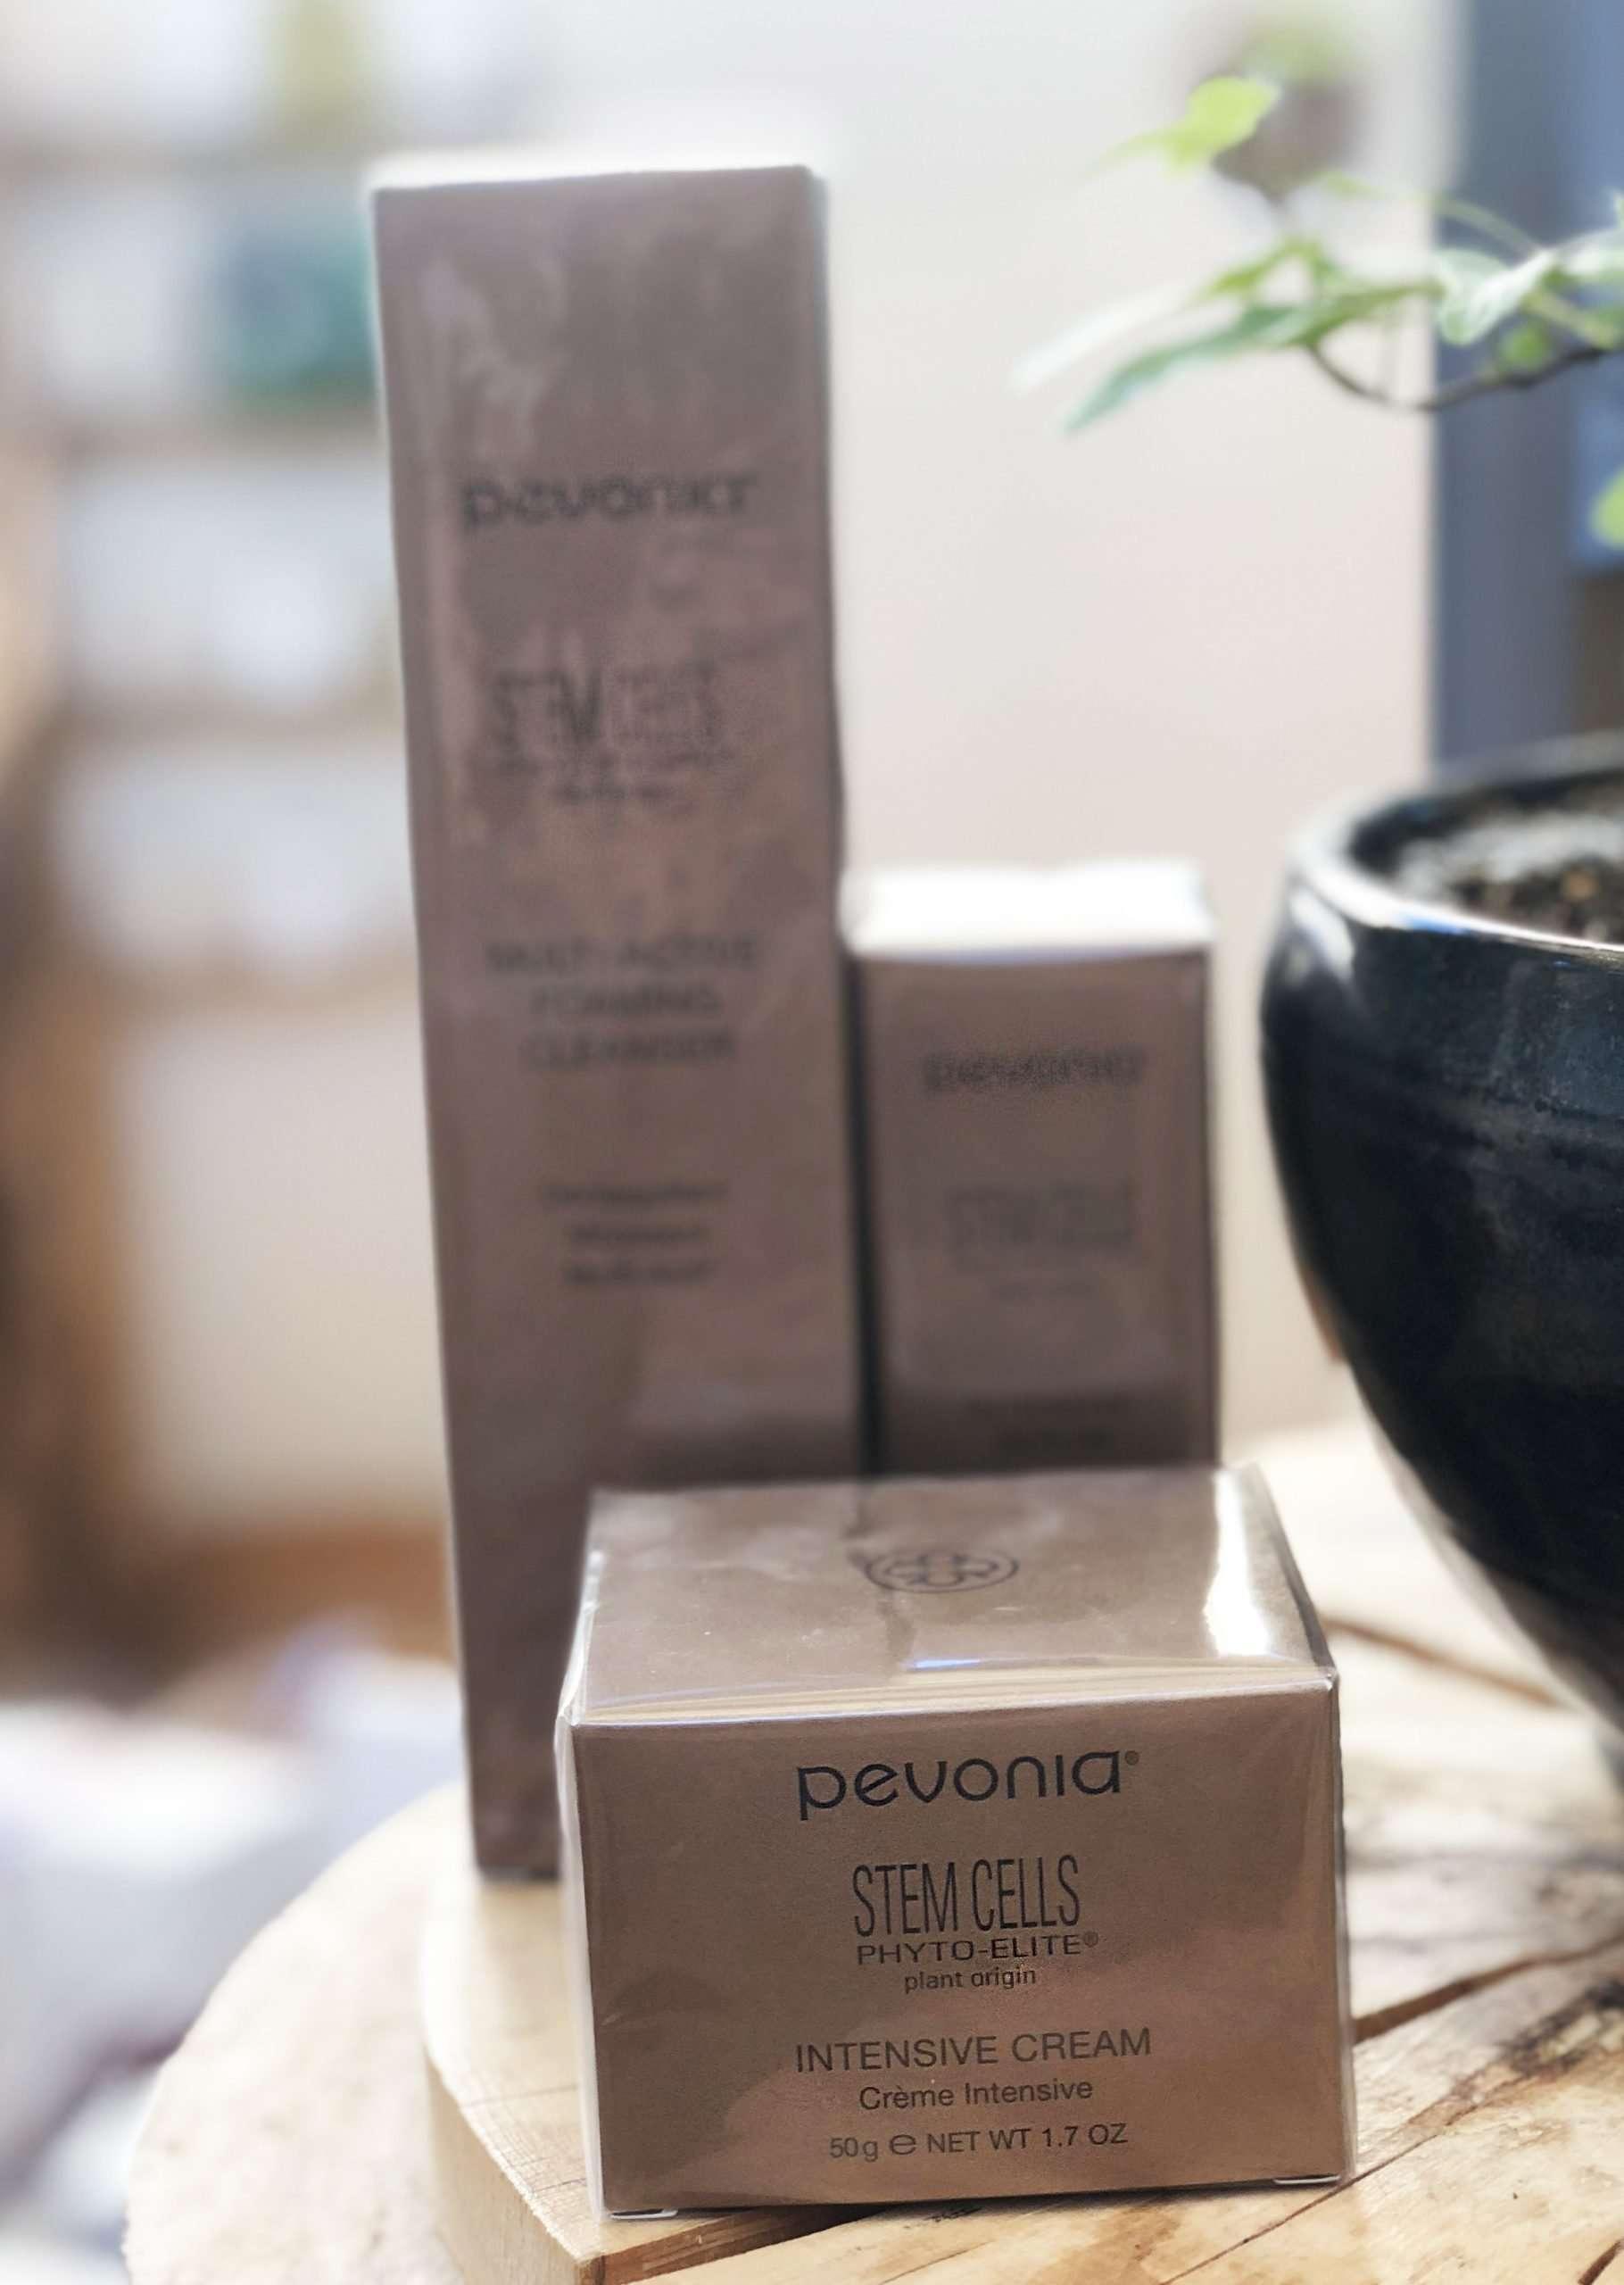 Stem Cells Pevonia Product